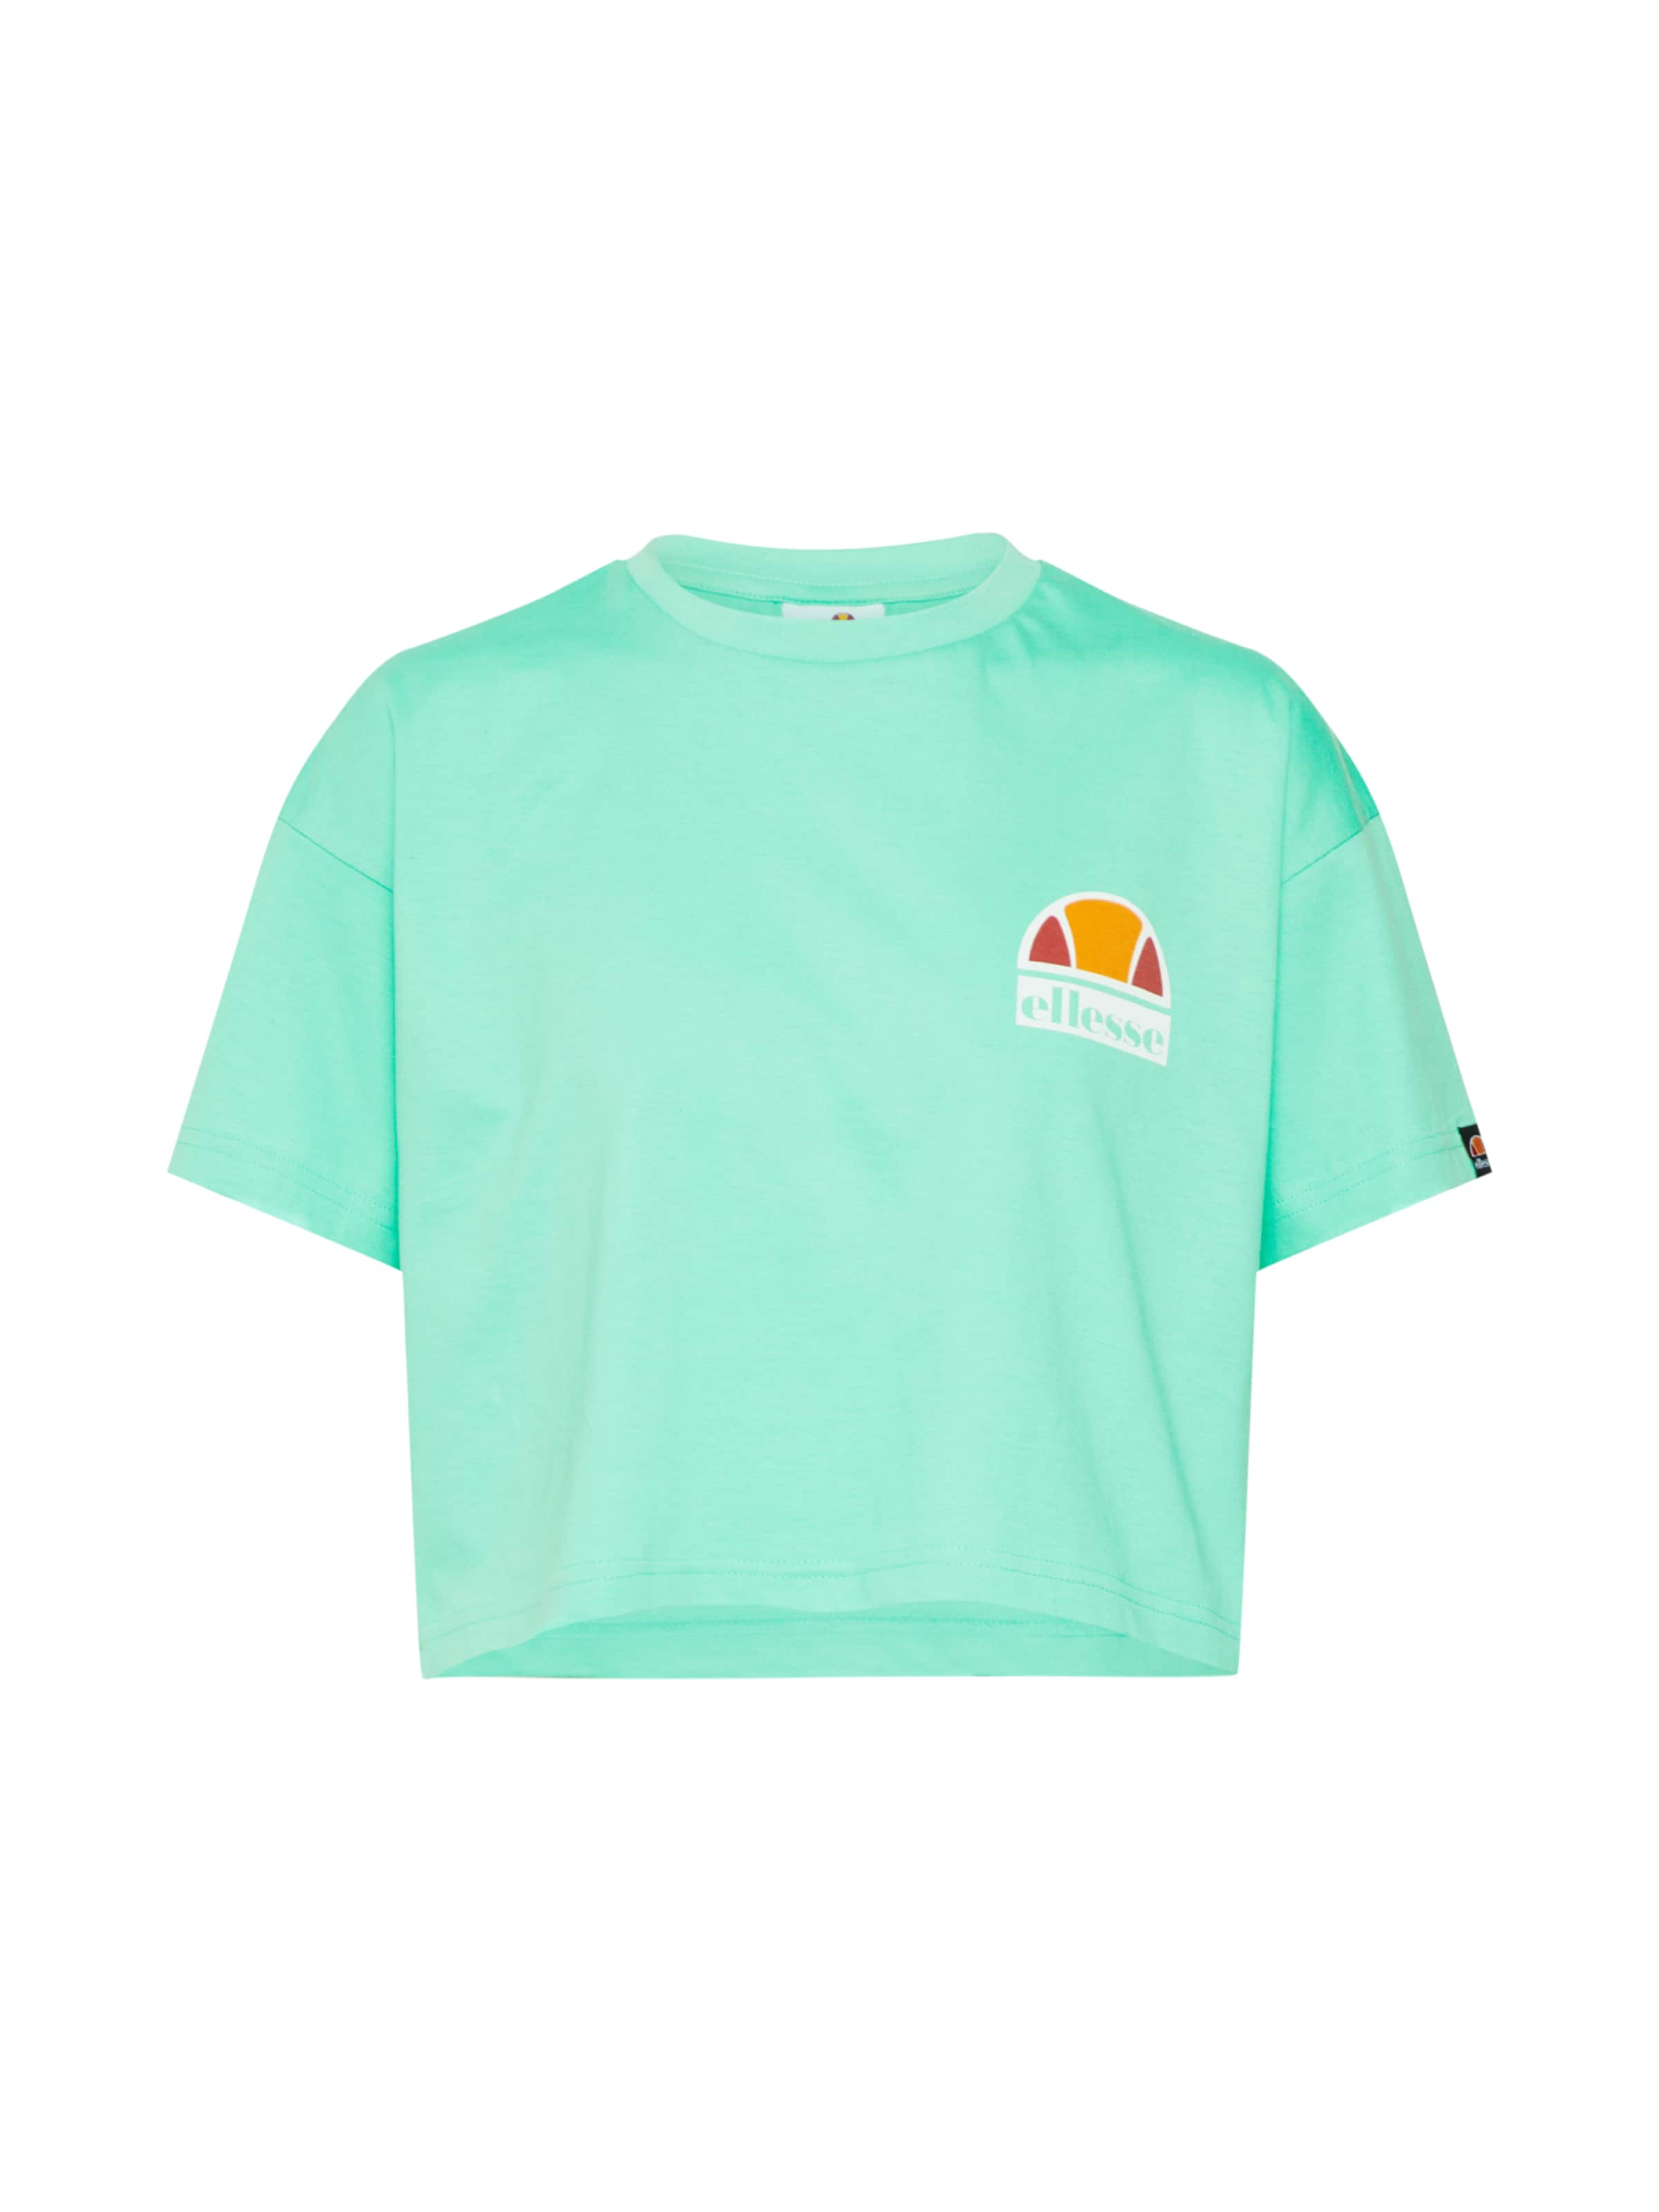 Mint T 'manila' In shirt Ellesse DHIWEY29